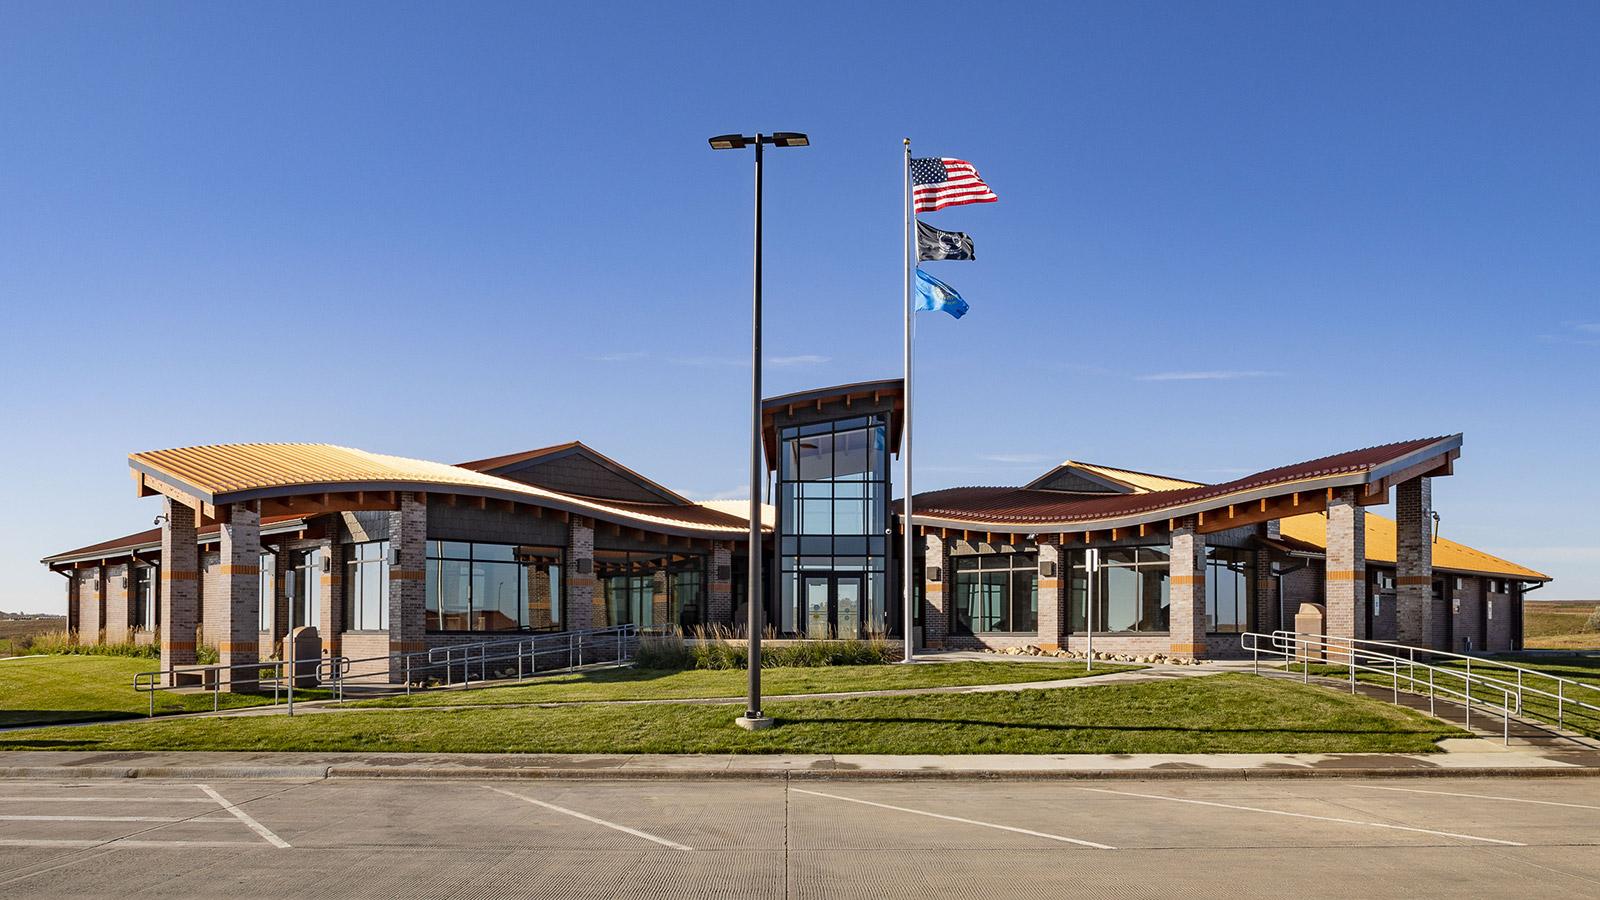 South Dakota Department of Transportation I-29 Wilmot Welcome Center